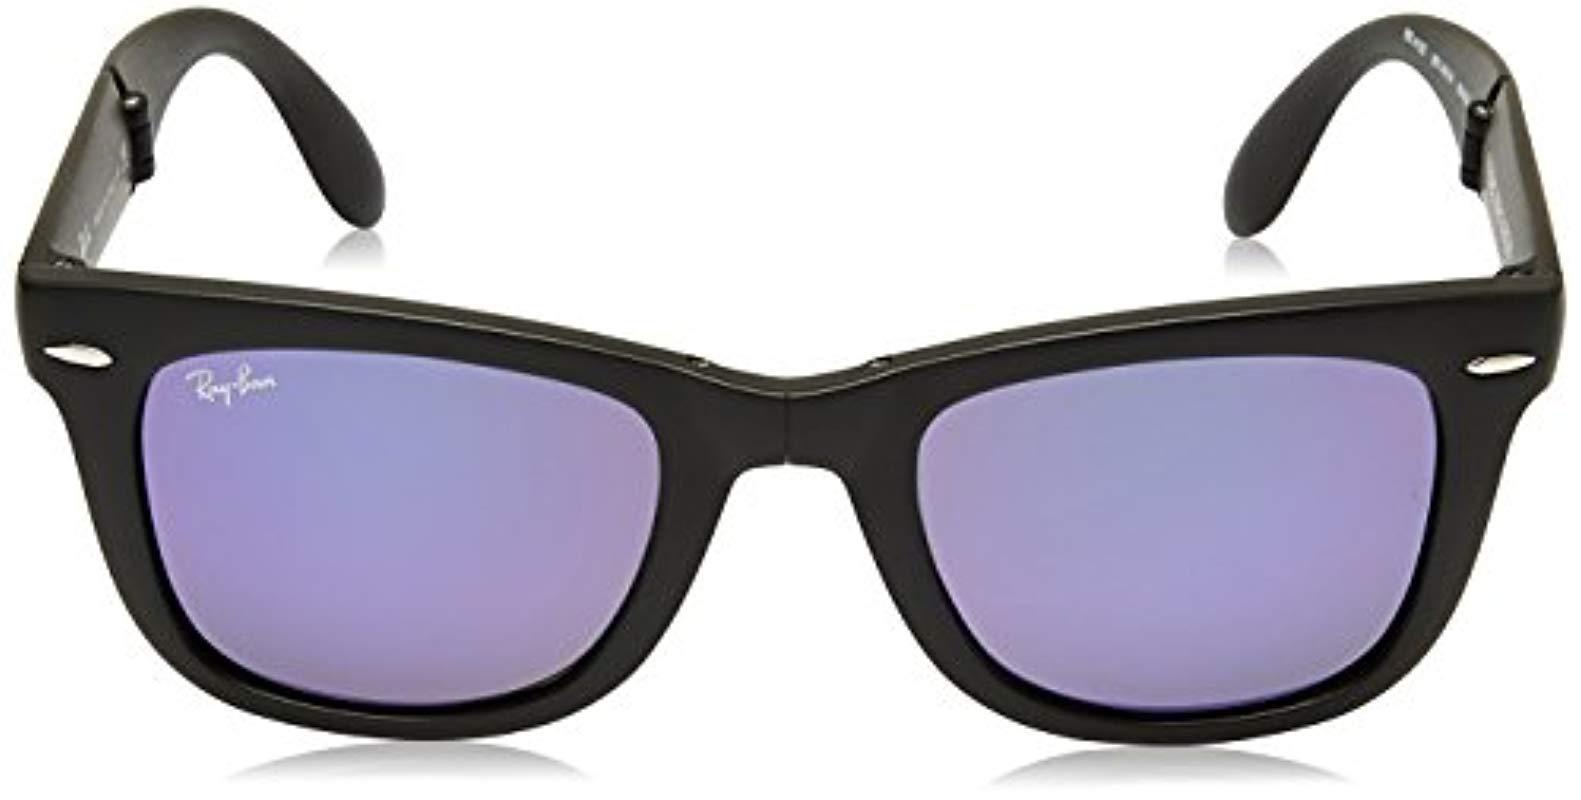 83296bc47 Ray-Ban - Black Rb4105 Wayfarer Folding Non-polarized Sunglasses 50mm - Lyst.  View fullscreen